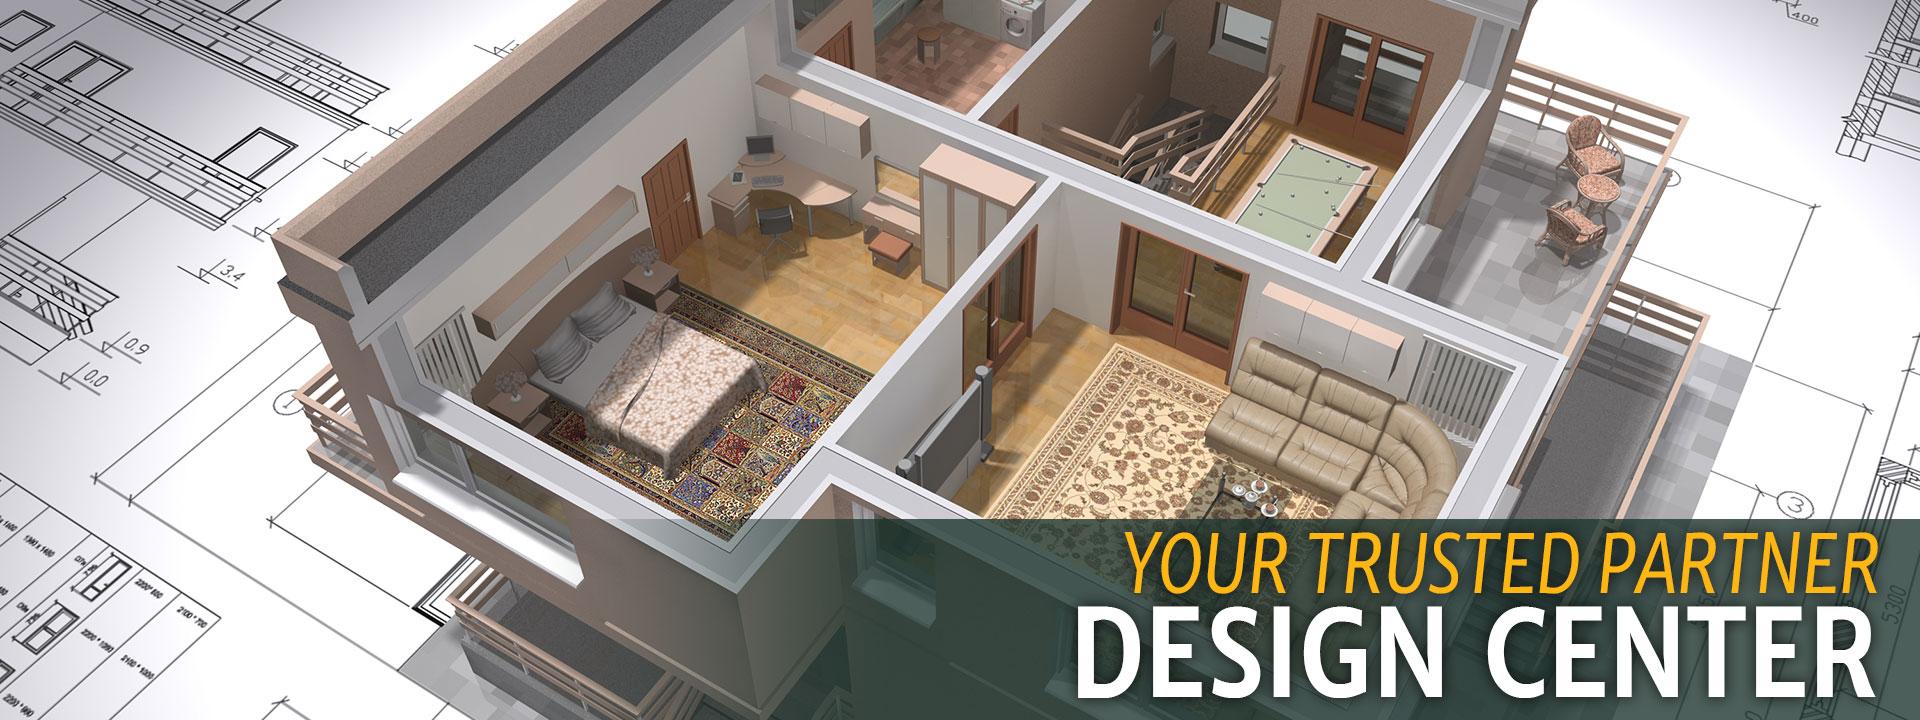 GreenHeart Design Center